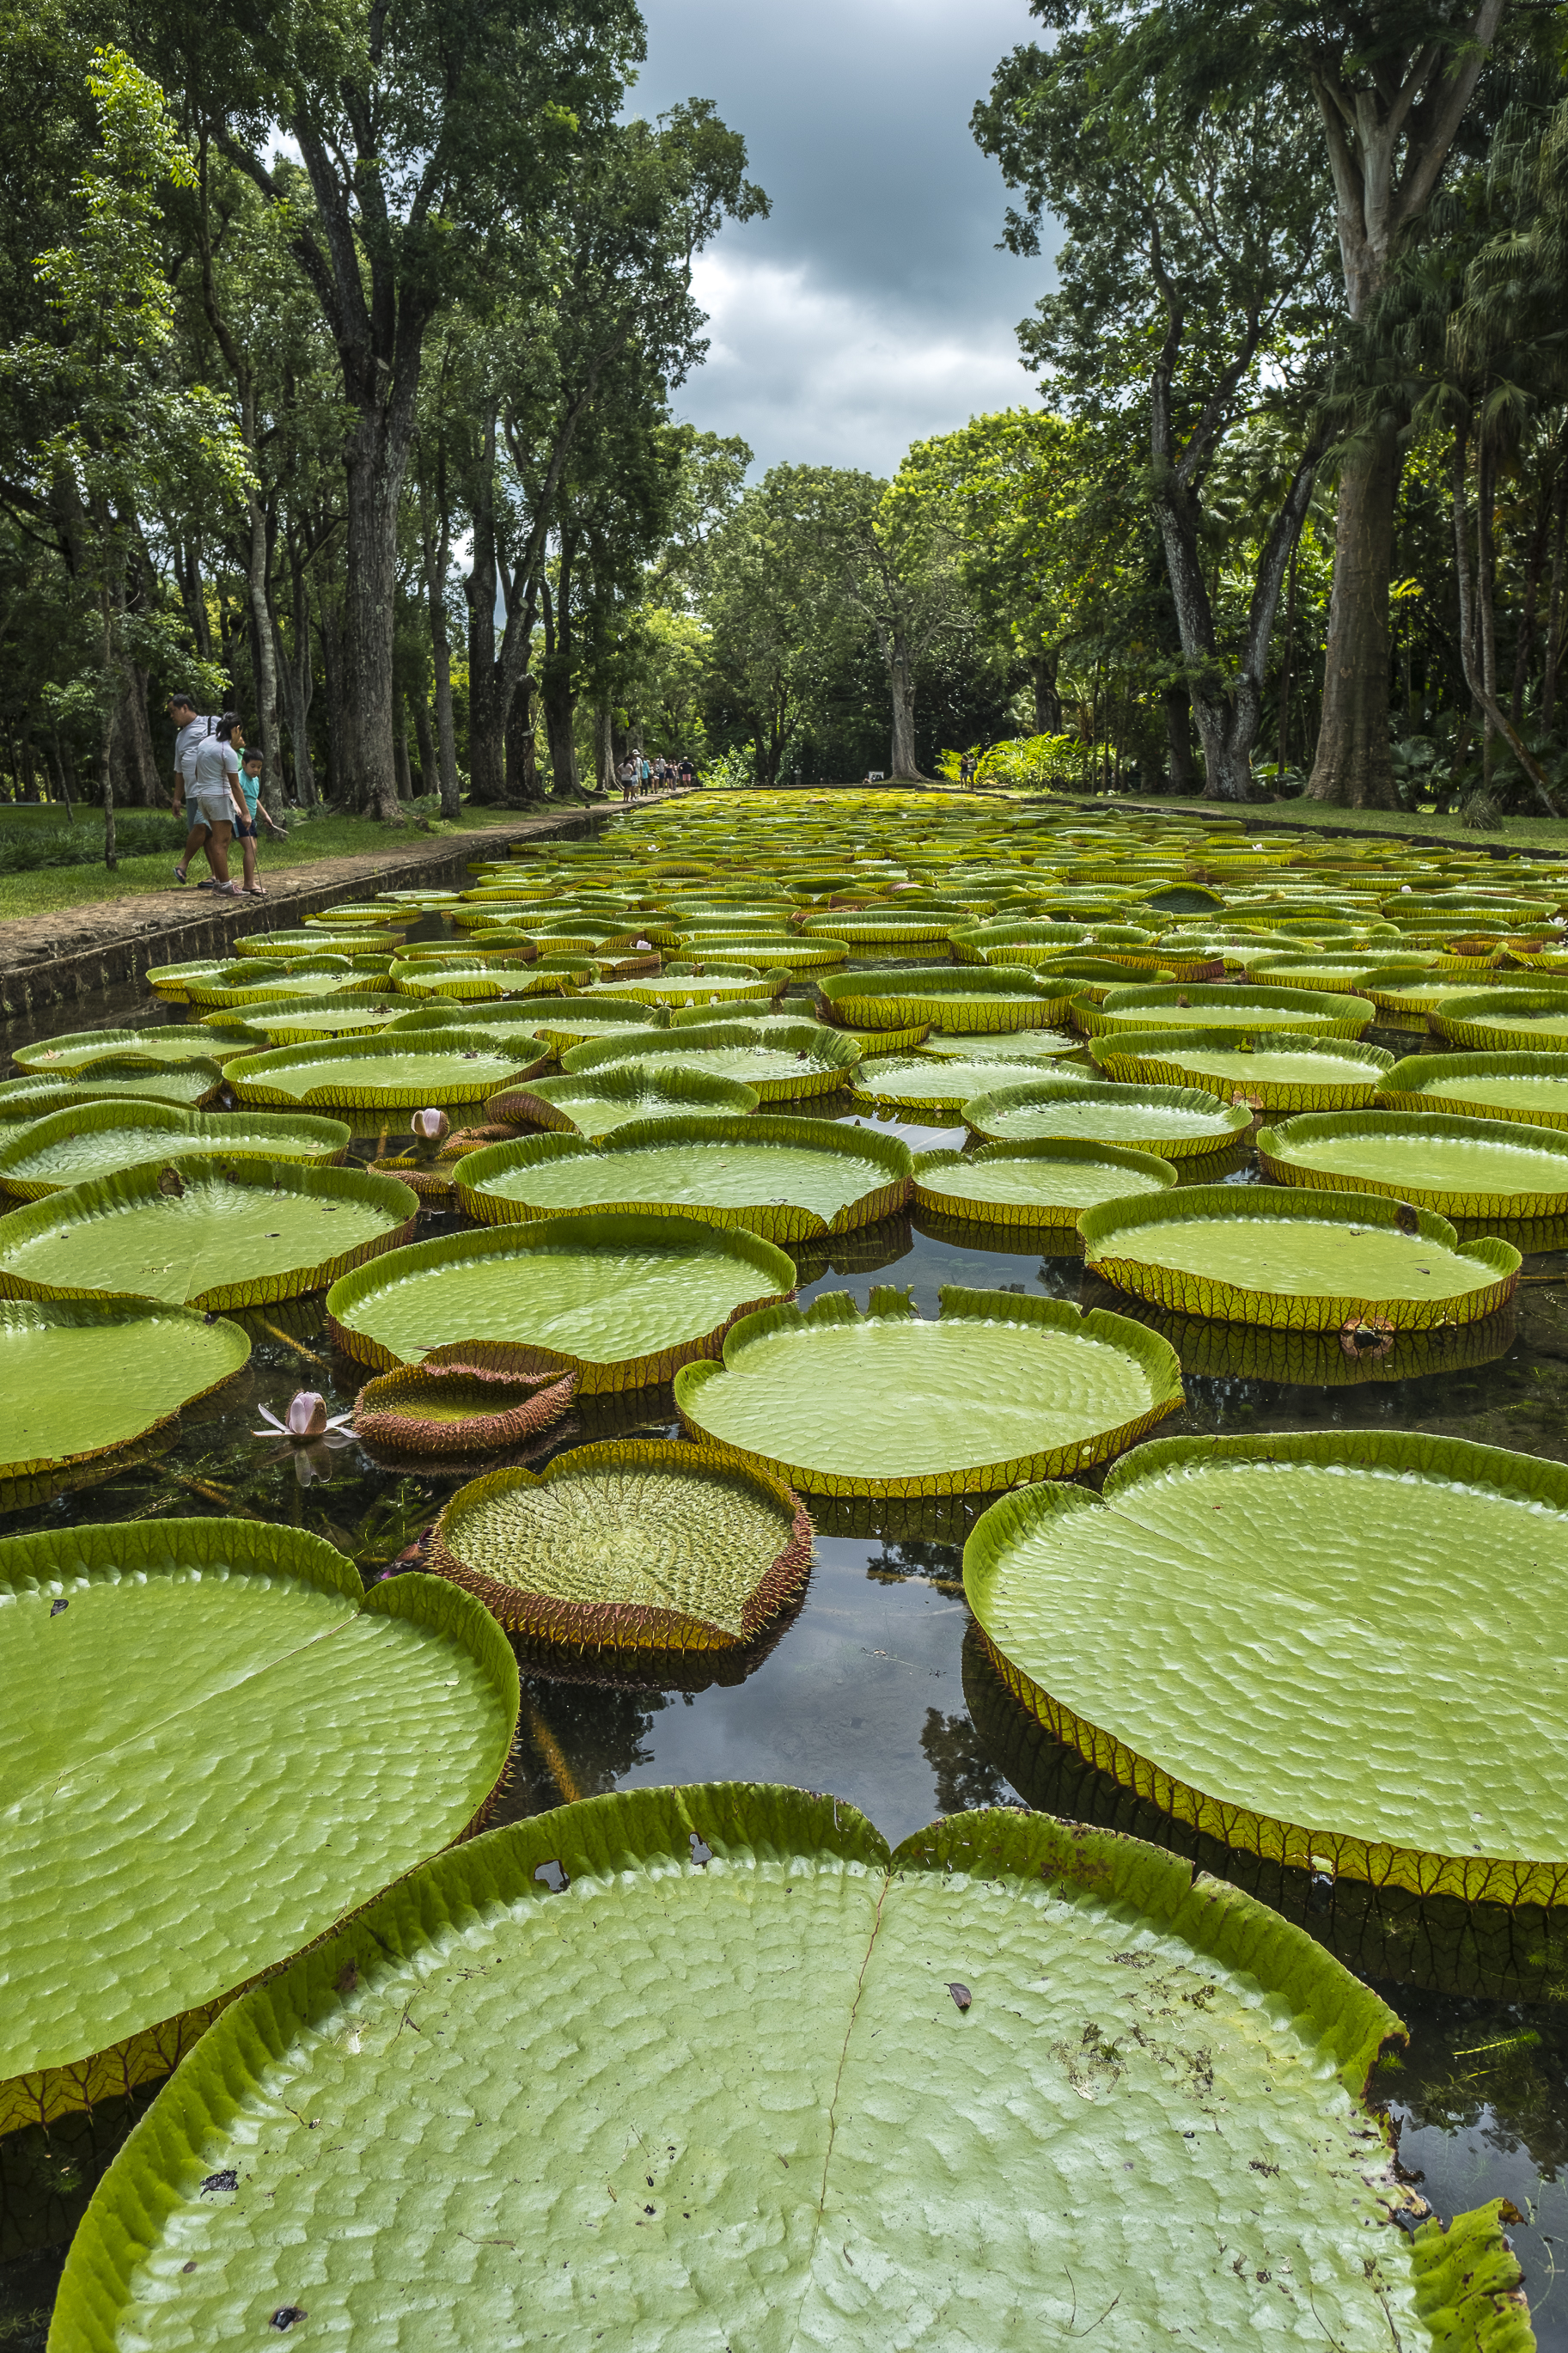 isla-mauricio-jardin-botanico-pamplemousses